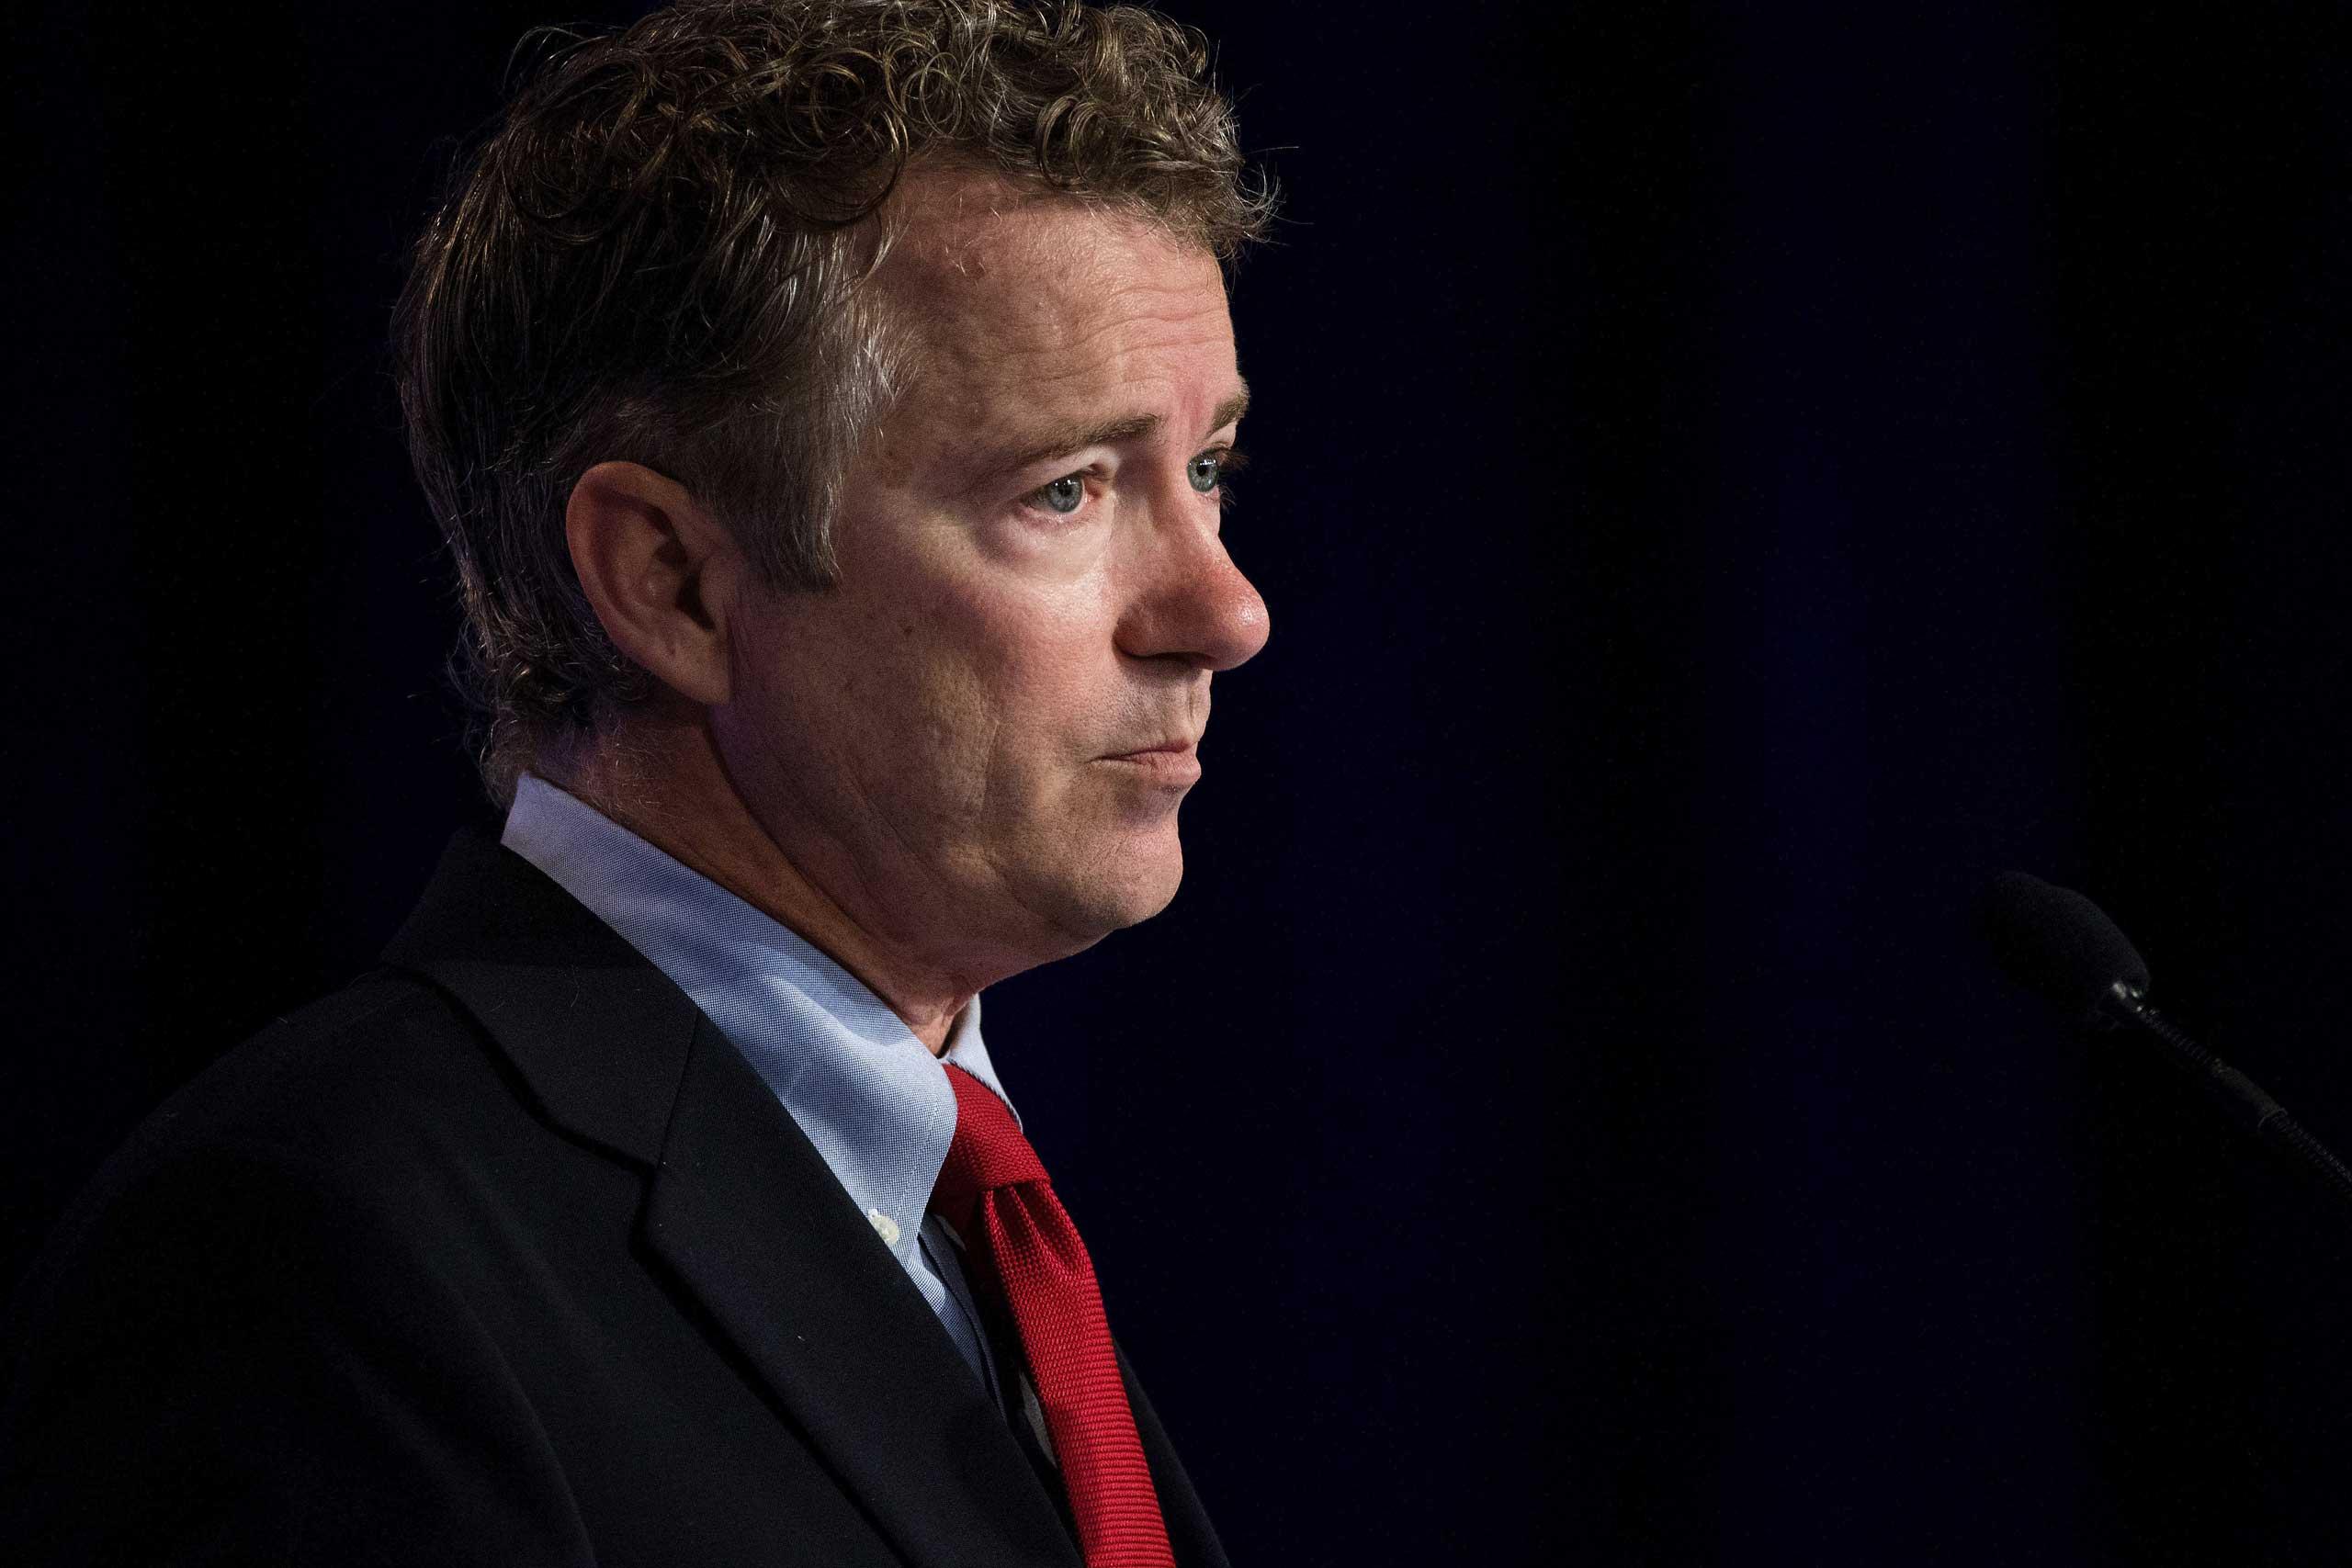 Sen. Rand Paul (R-Ky.) speaks at the Values Voter Summit in Washington, Sept. 26, 2014.